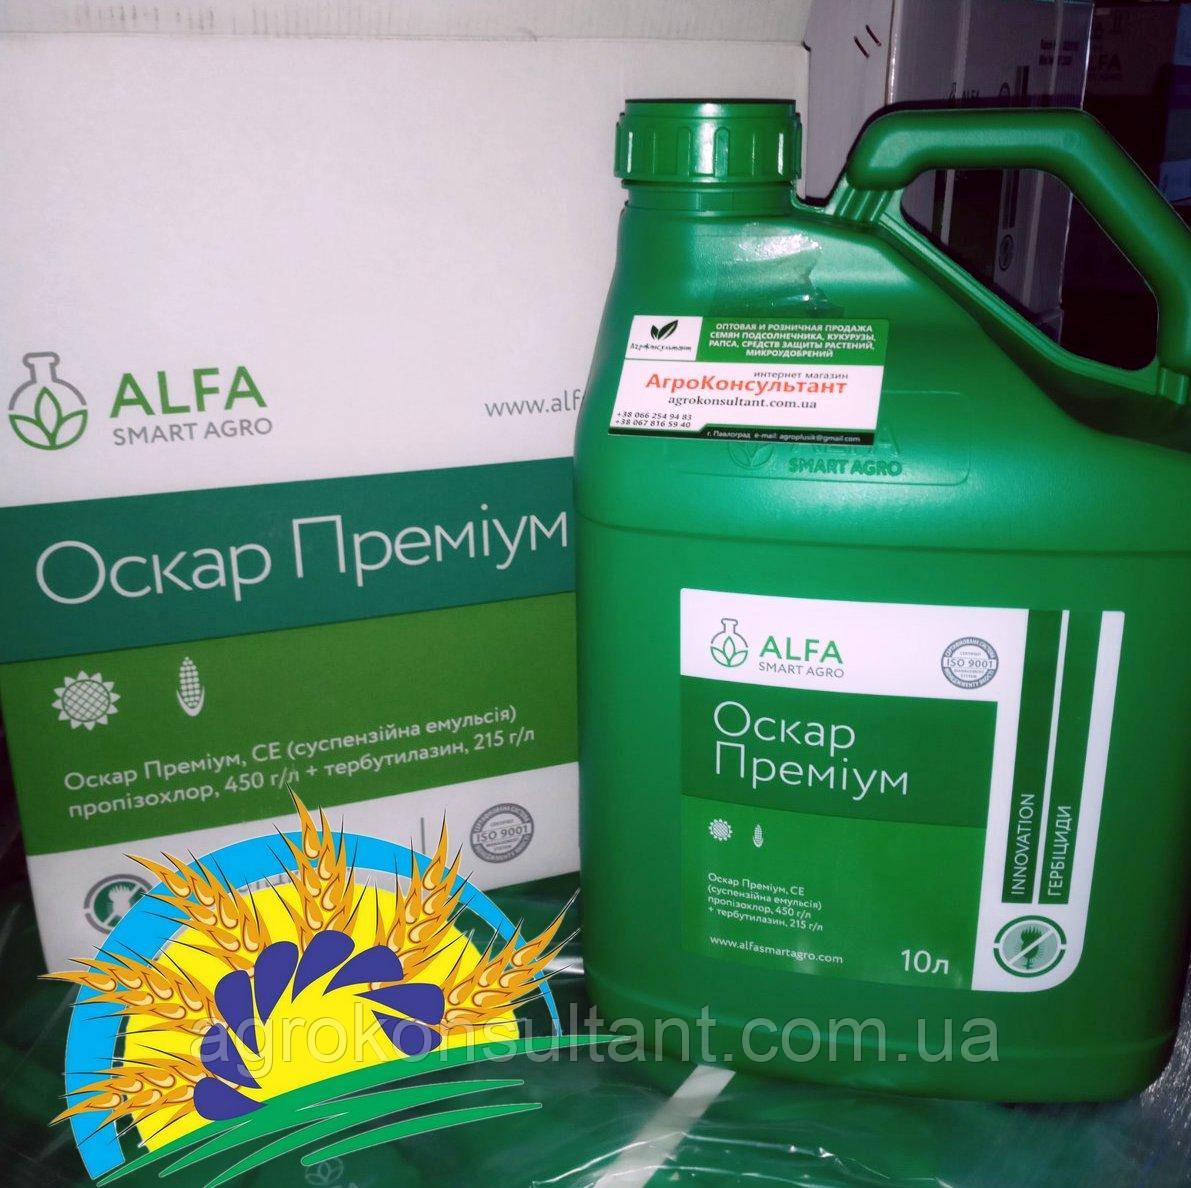 Оскар Премиум, 10л - ПОЧВЕННЫЙ гербицид (пропизохлор 450г/л, тербутилазин 215г/л) ALFA Smart Agro